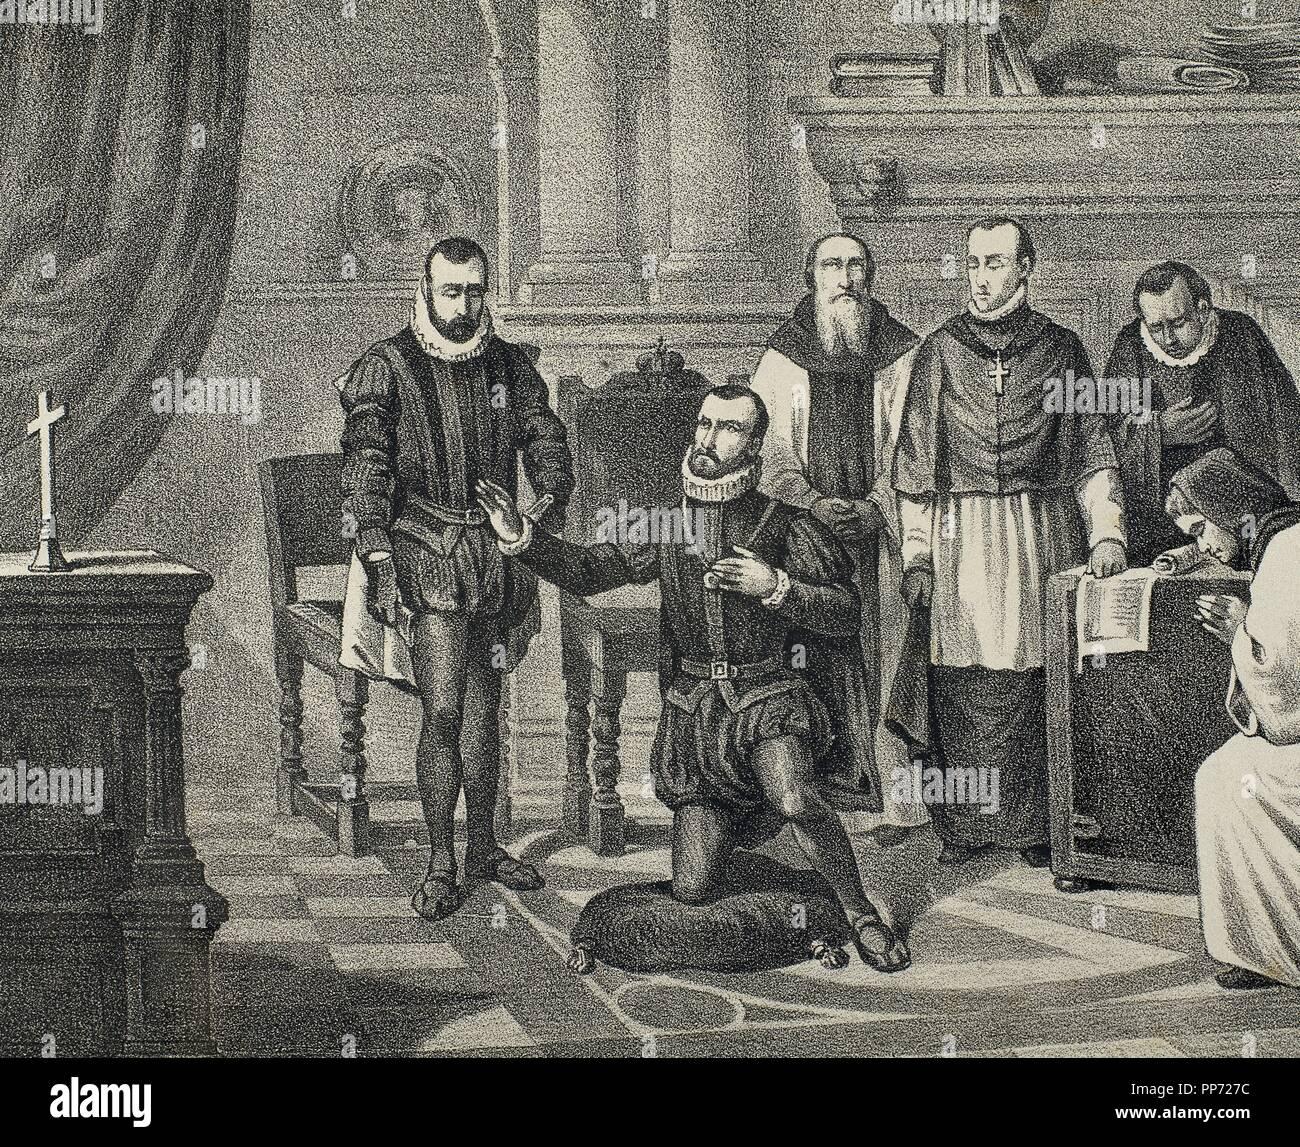 Philip II of Spain (1527-1598). House of Habsburg. King imploring God. Engraving. 19th century. - Stock Image